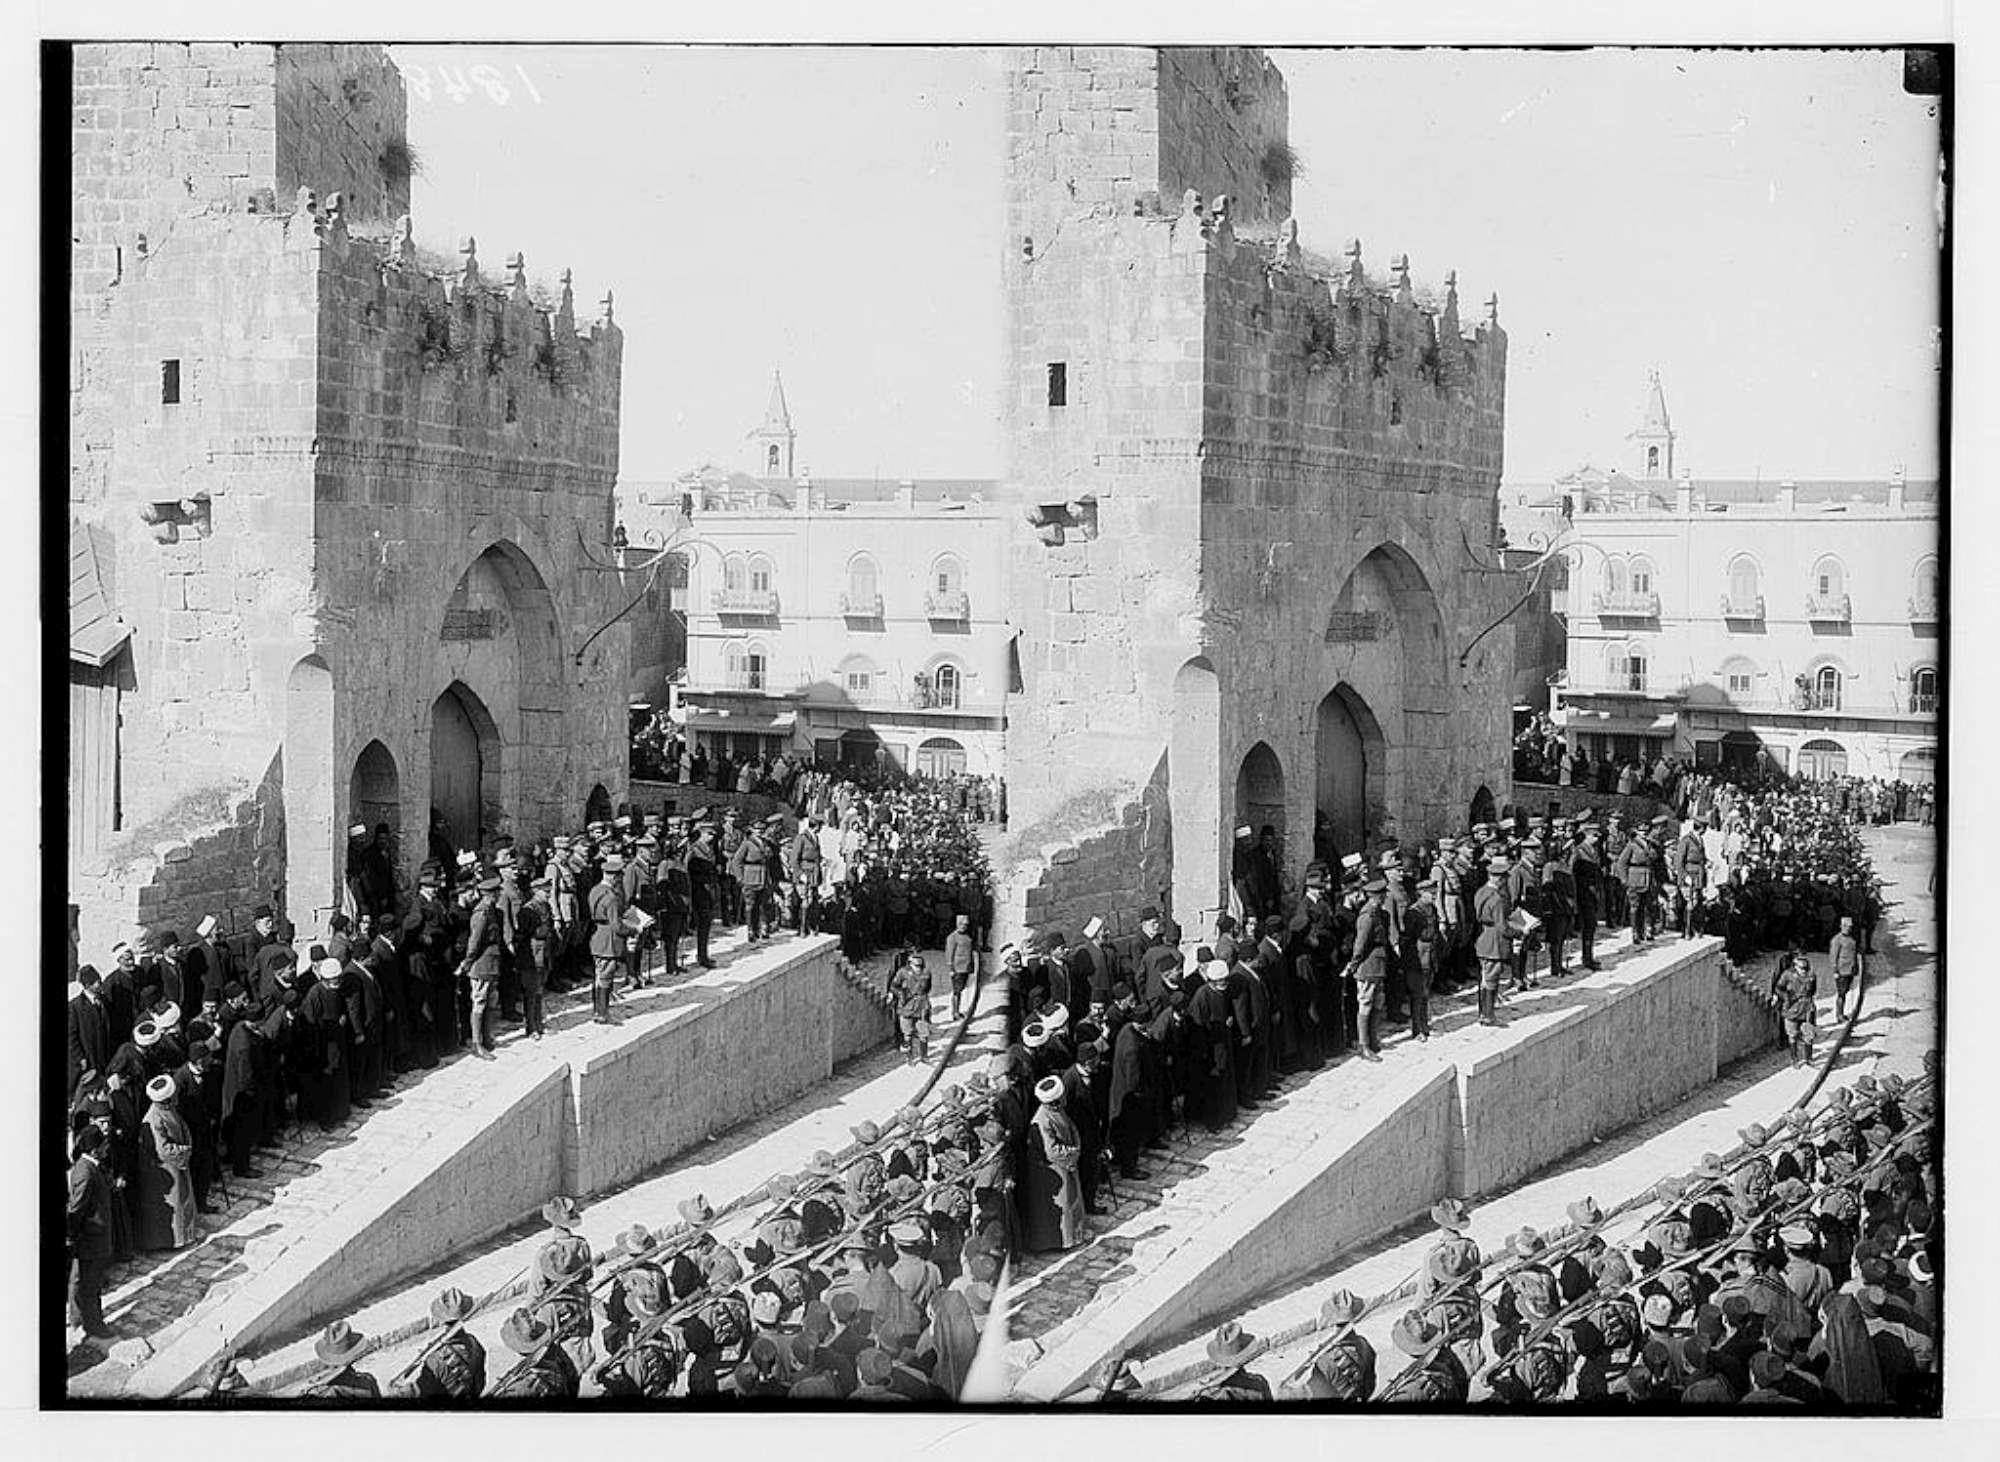 Cent anni fa la liberazione di Gerusalemme: l entrata in città del generale Allenby